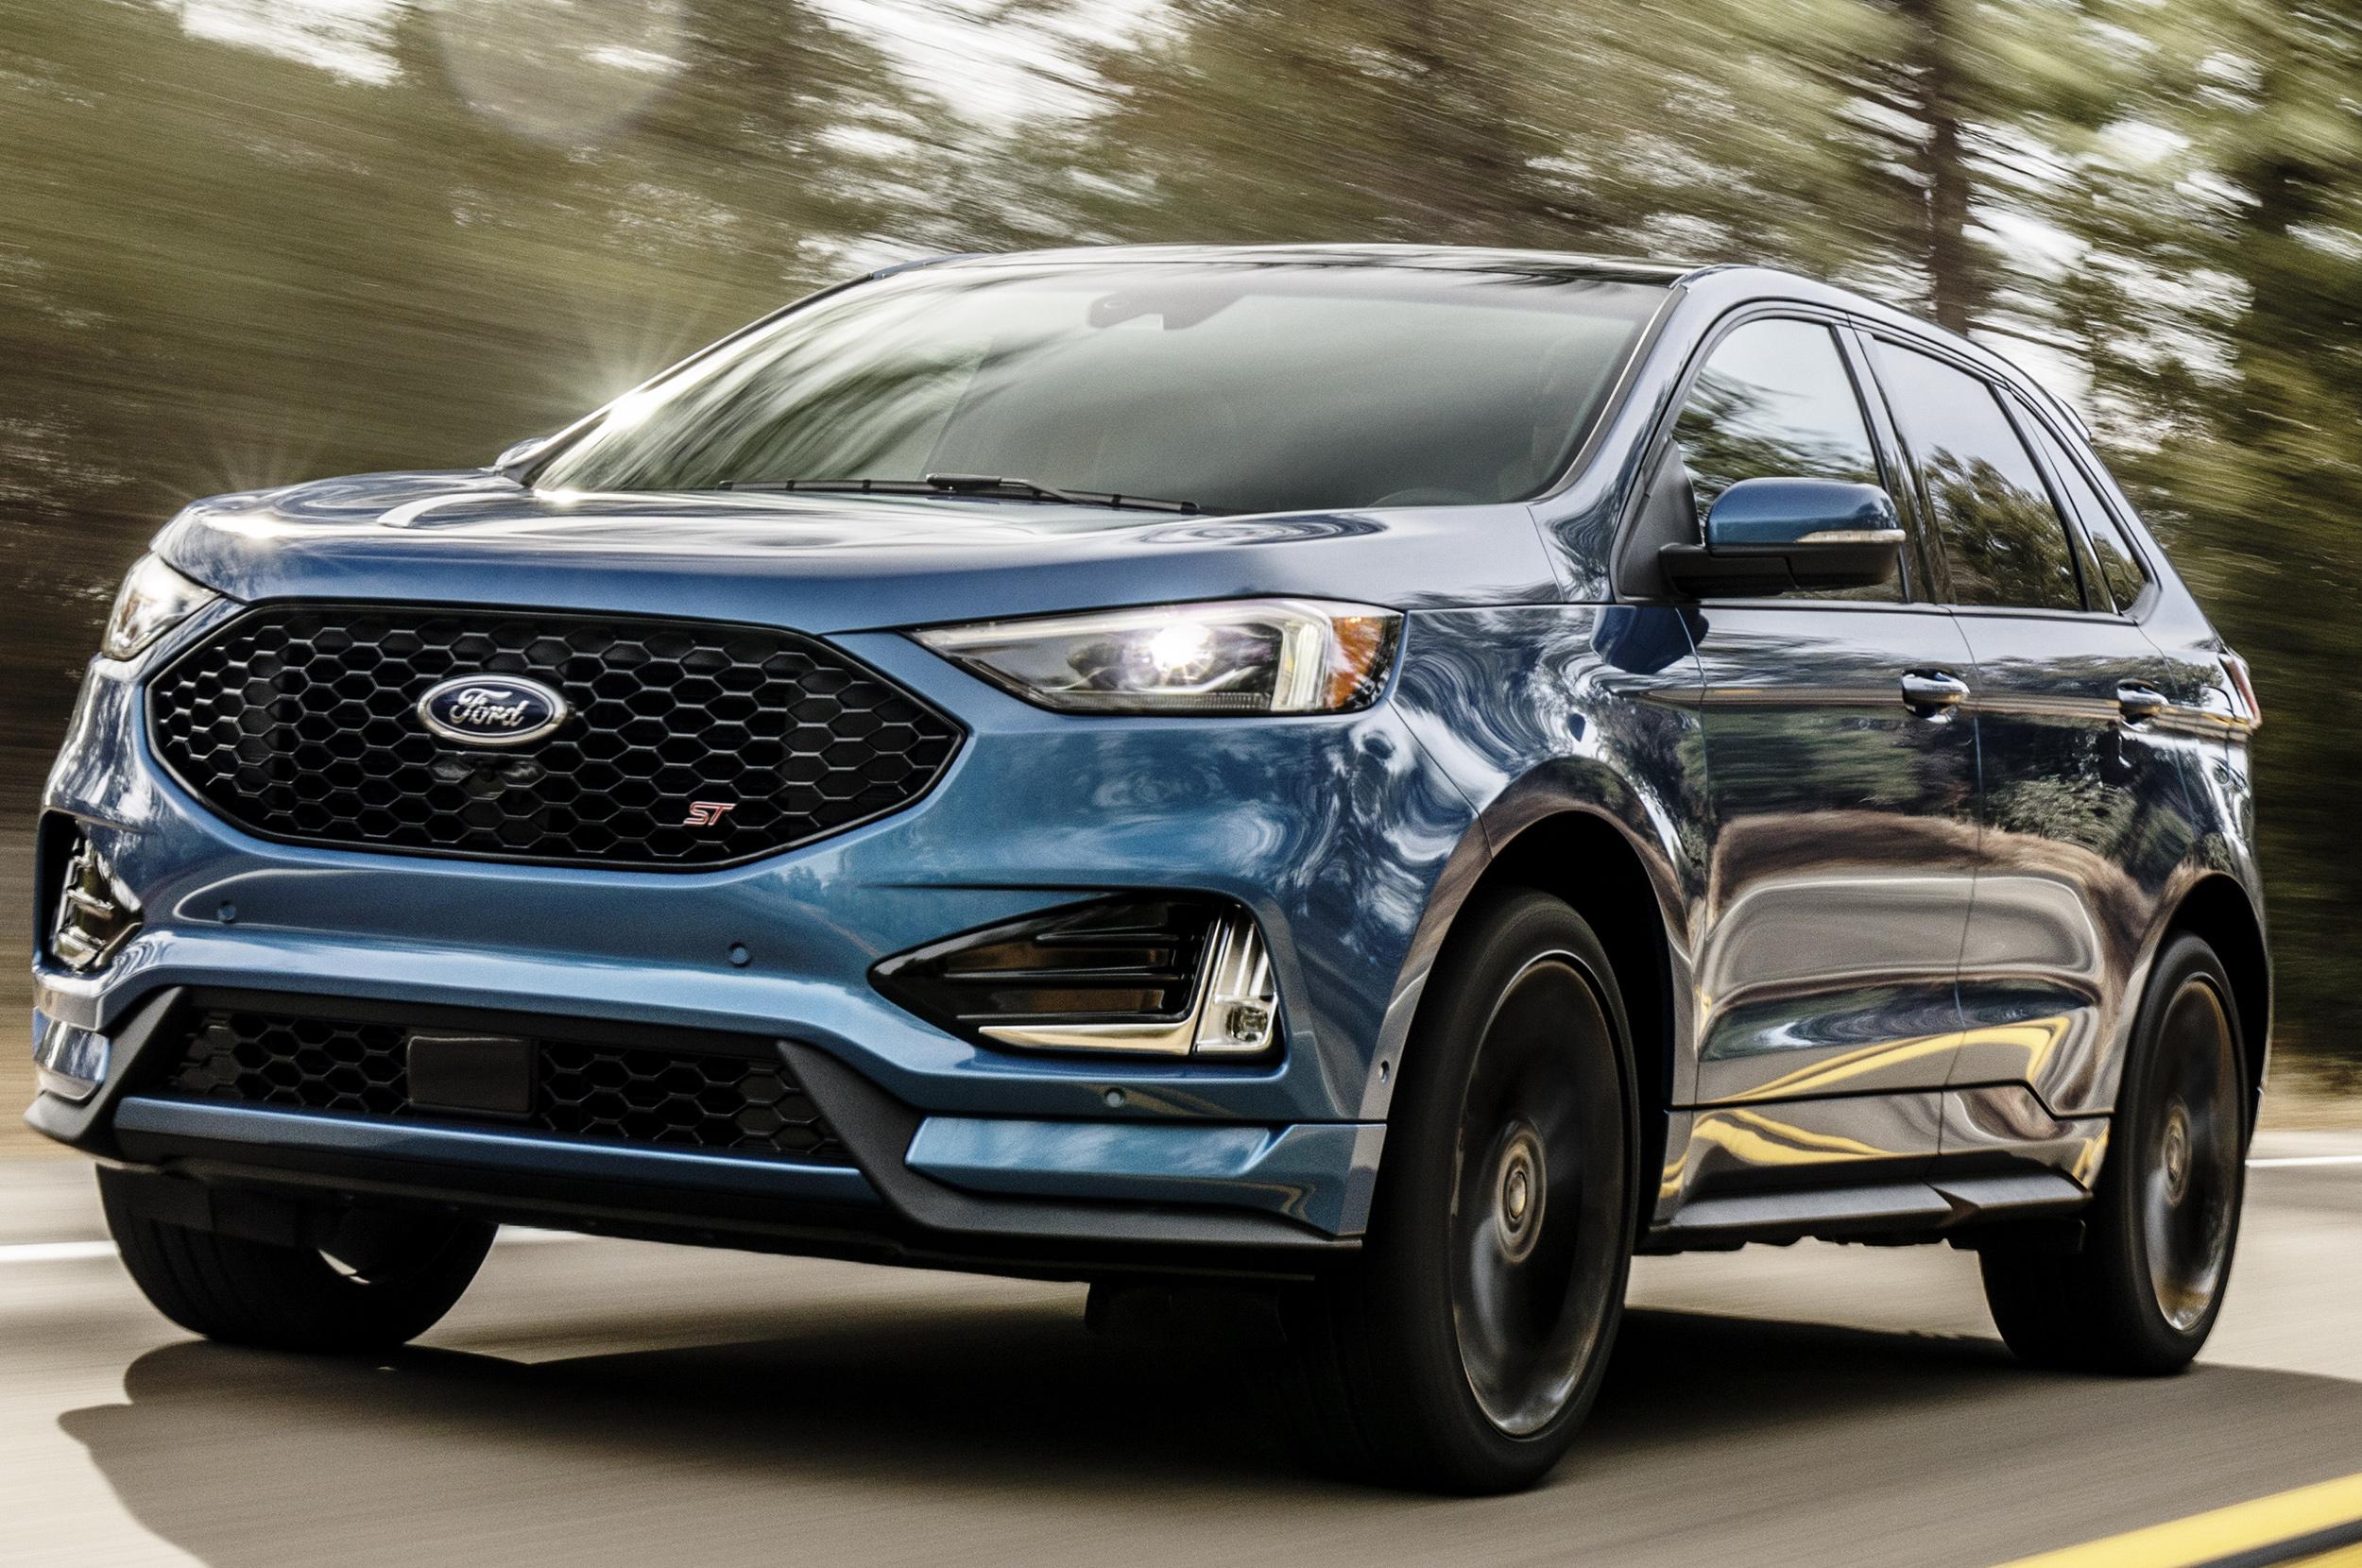 2020 Ford Edge Reviews - MSN Autos